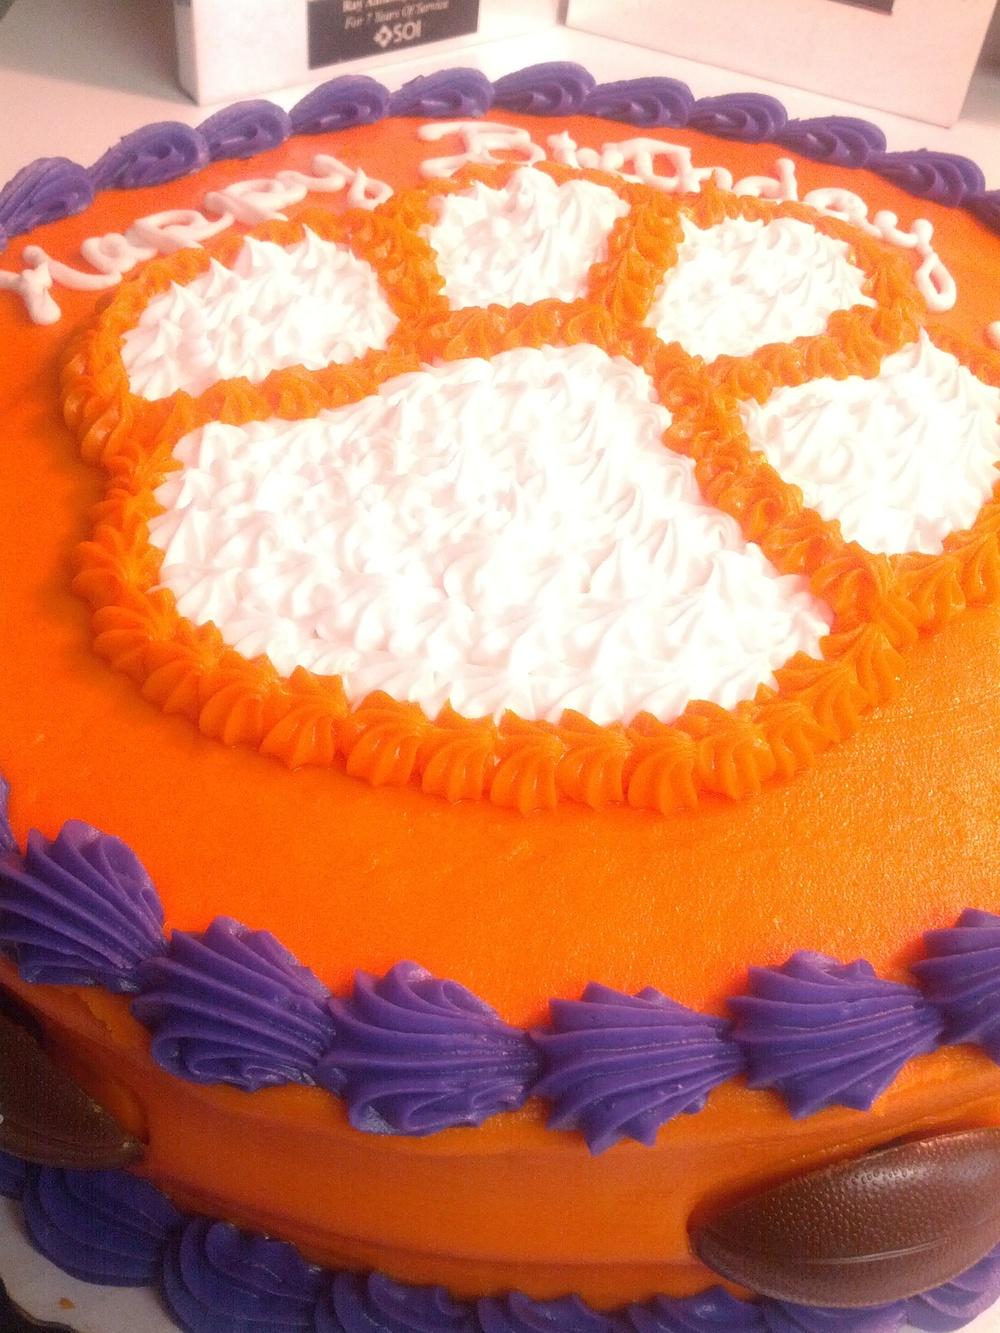 image credit Ant Pruitt for antpruitt.com